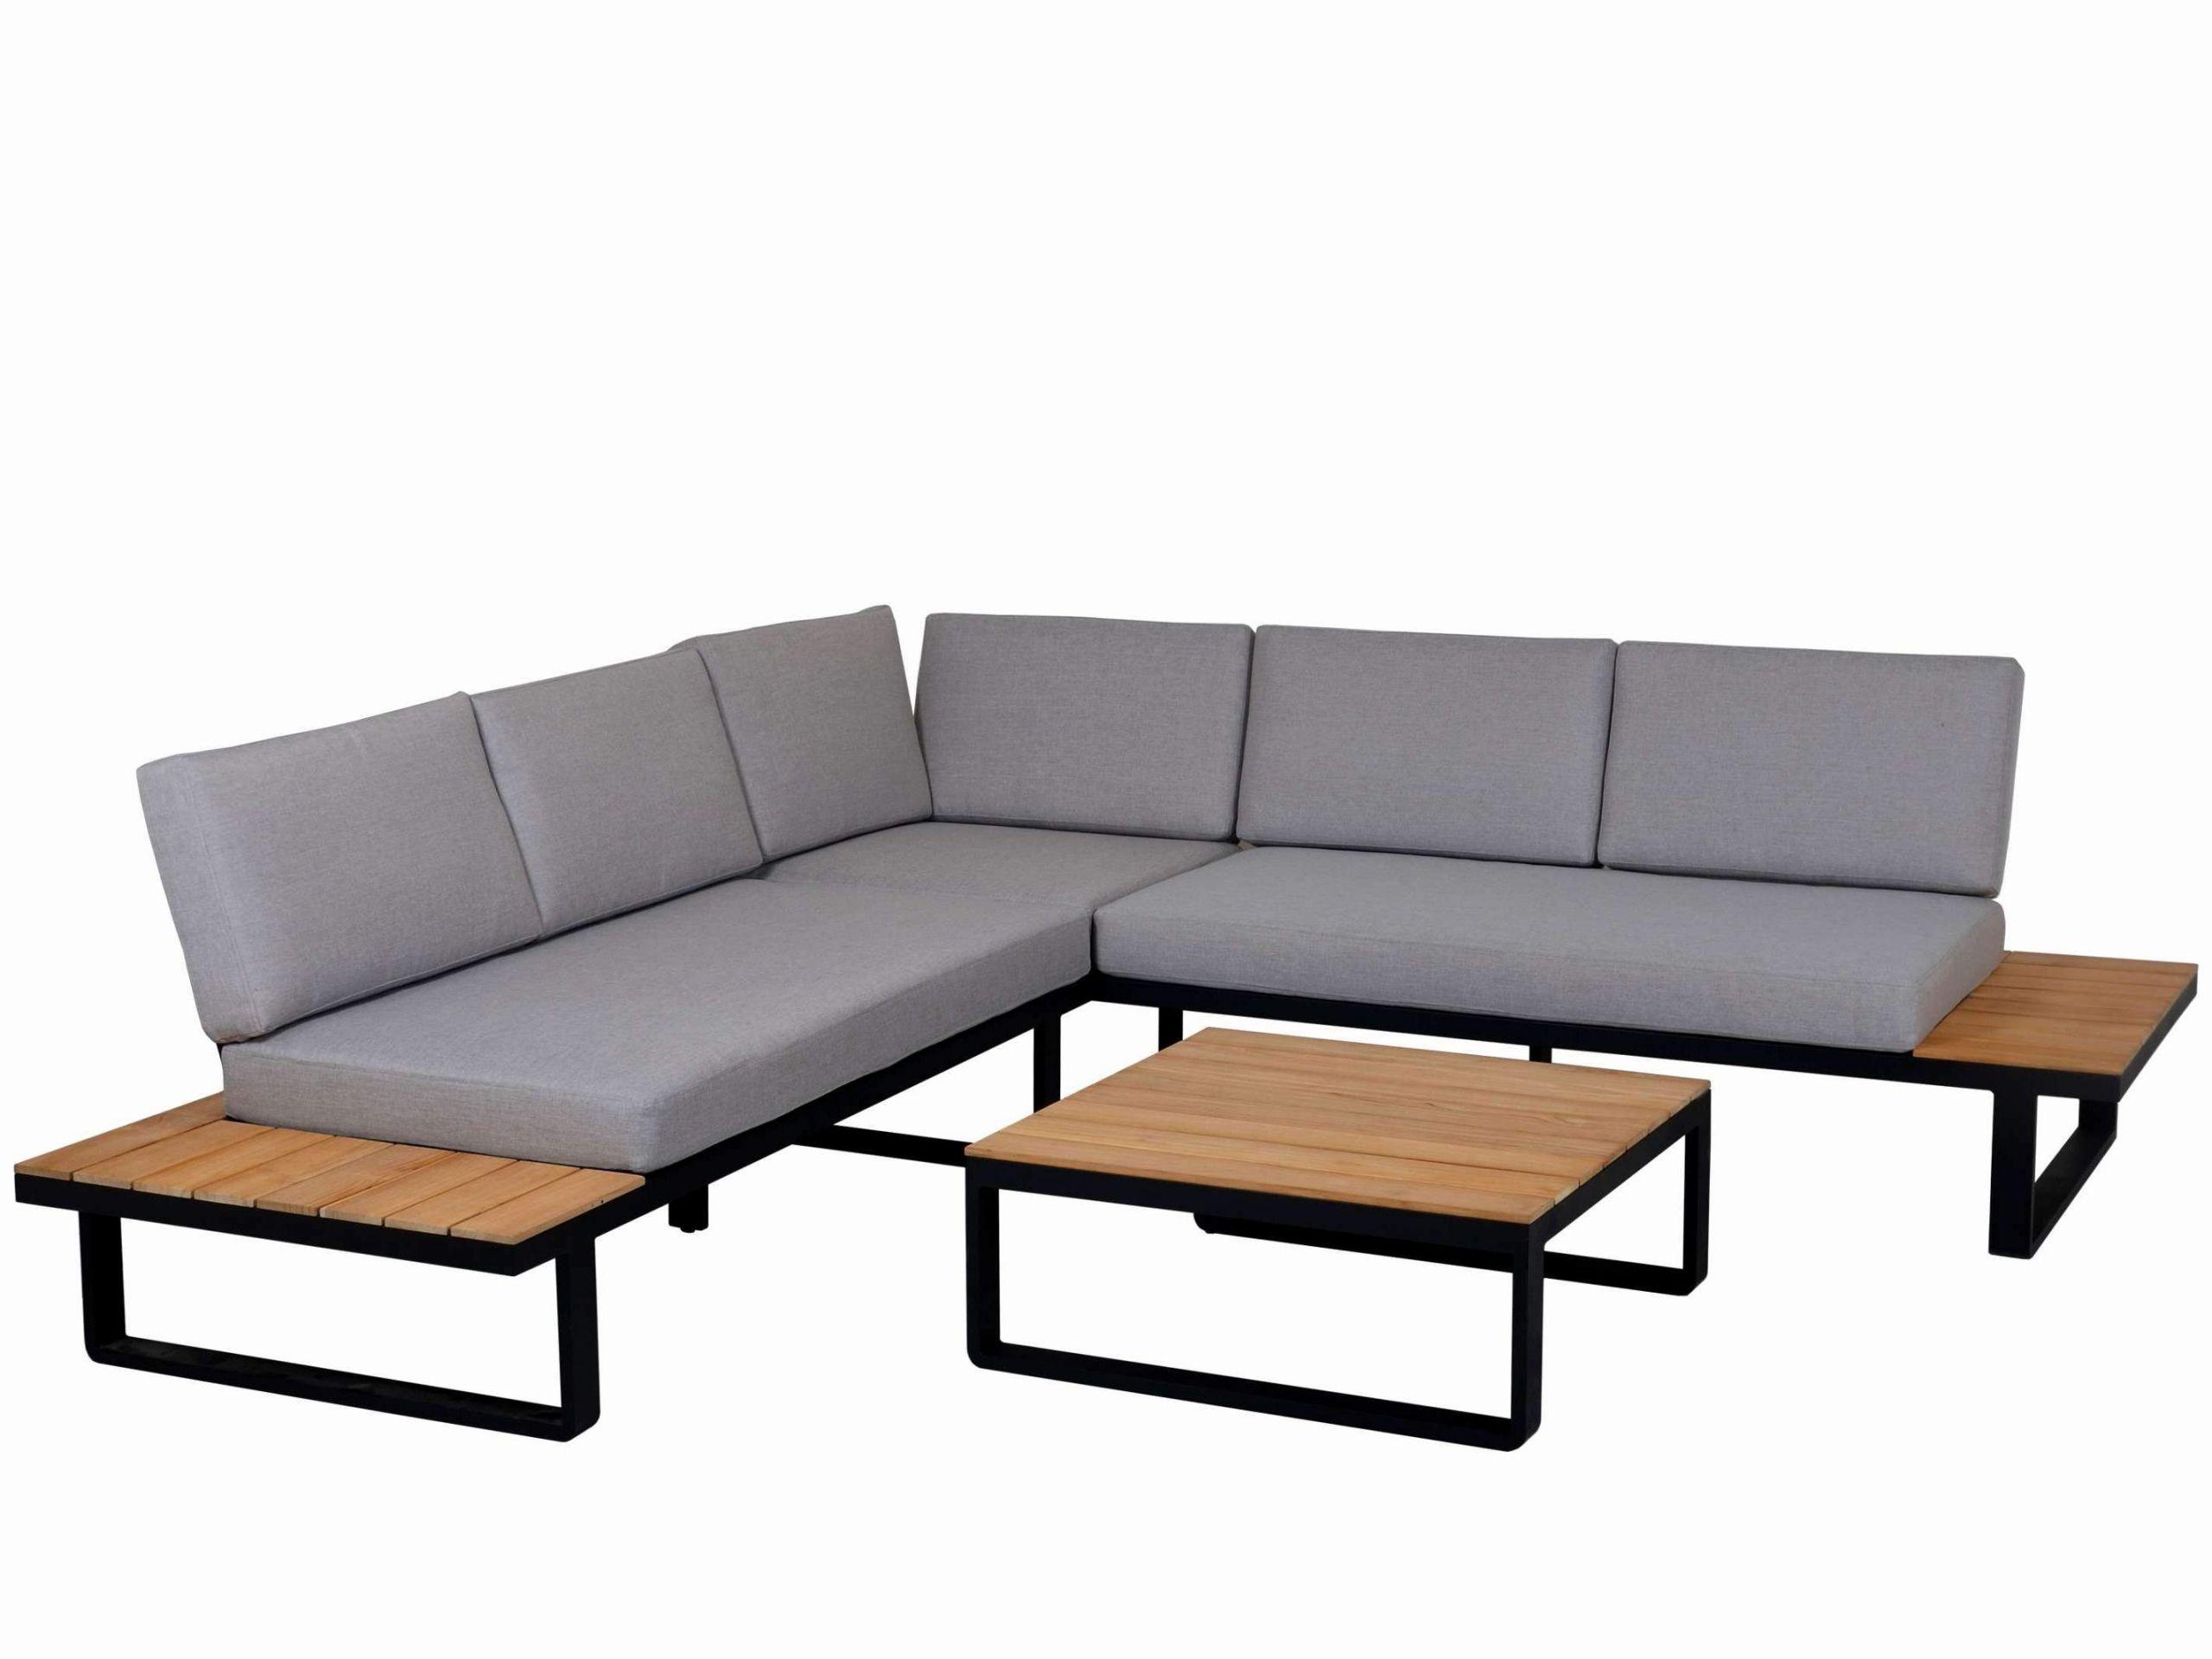 Lounge Sessel Garten Frisch 42 Von Loungesessel Polyrattan Ideen